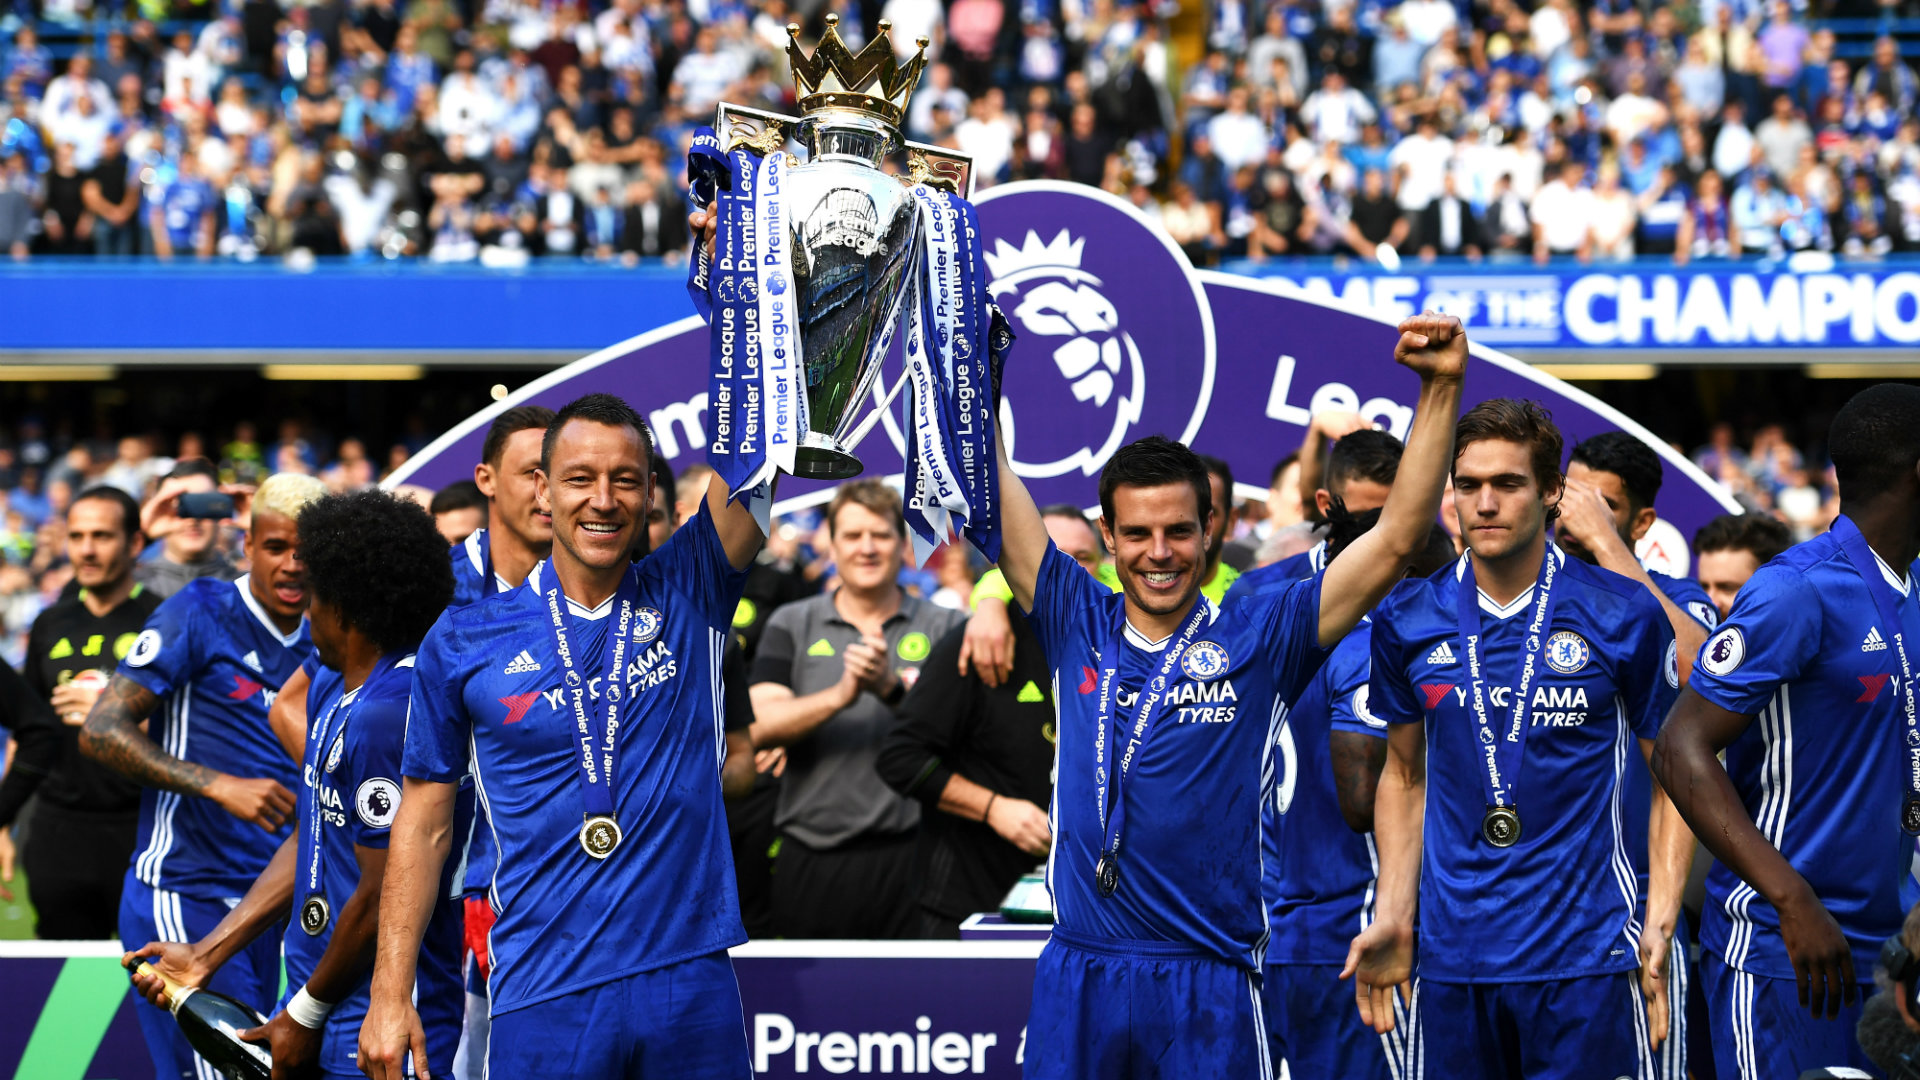 Chelsea 2016/17 Premier League champions, John Terry, Cesar Azpilicueta